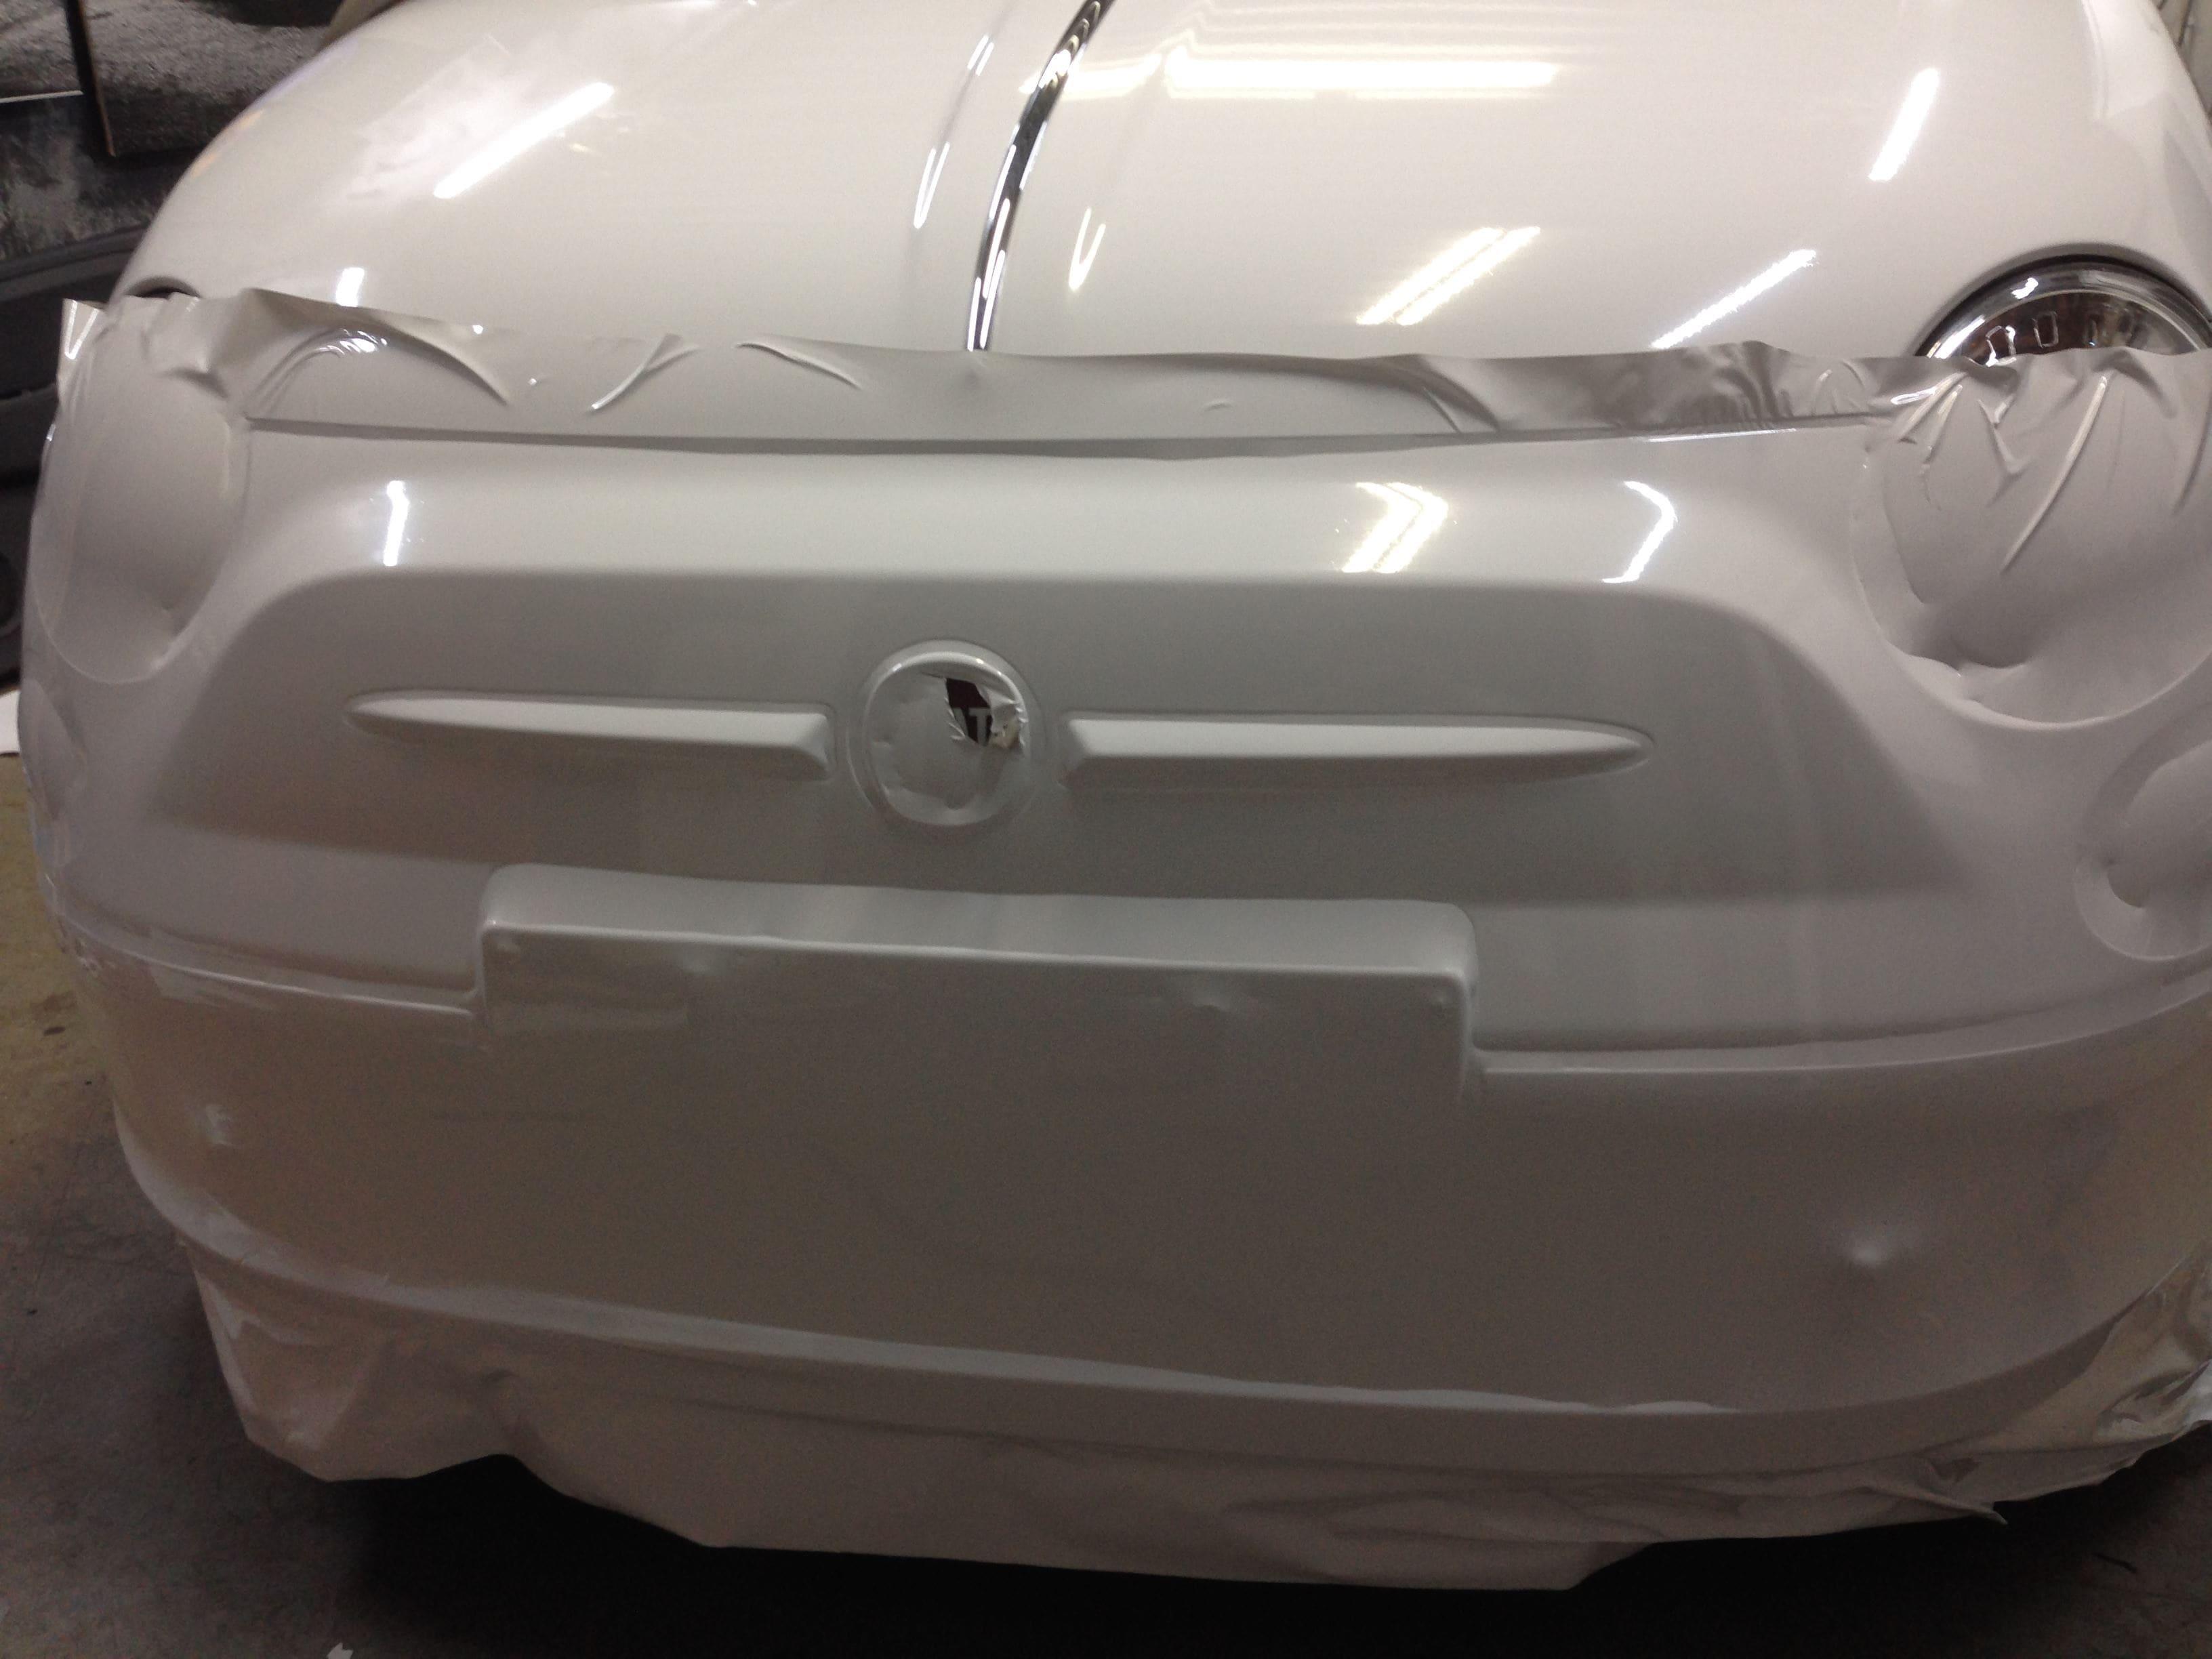 Fiat 500 met Glossy White Wrap, Carwrapping door Wrapmyride.nu Foto-nr:5724, ©2020